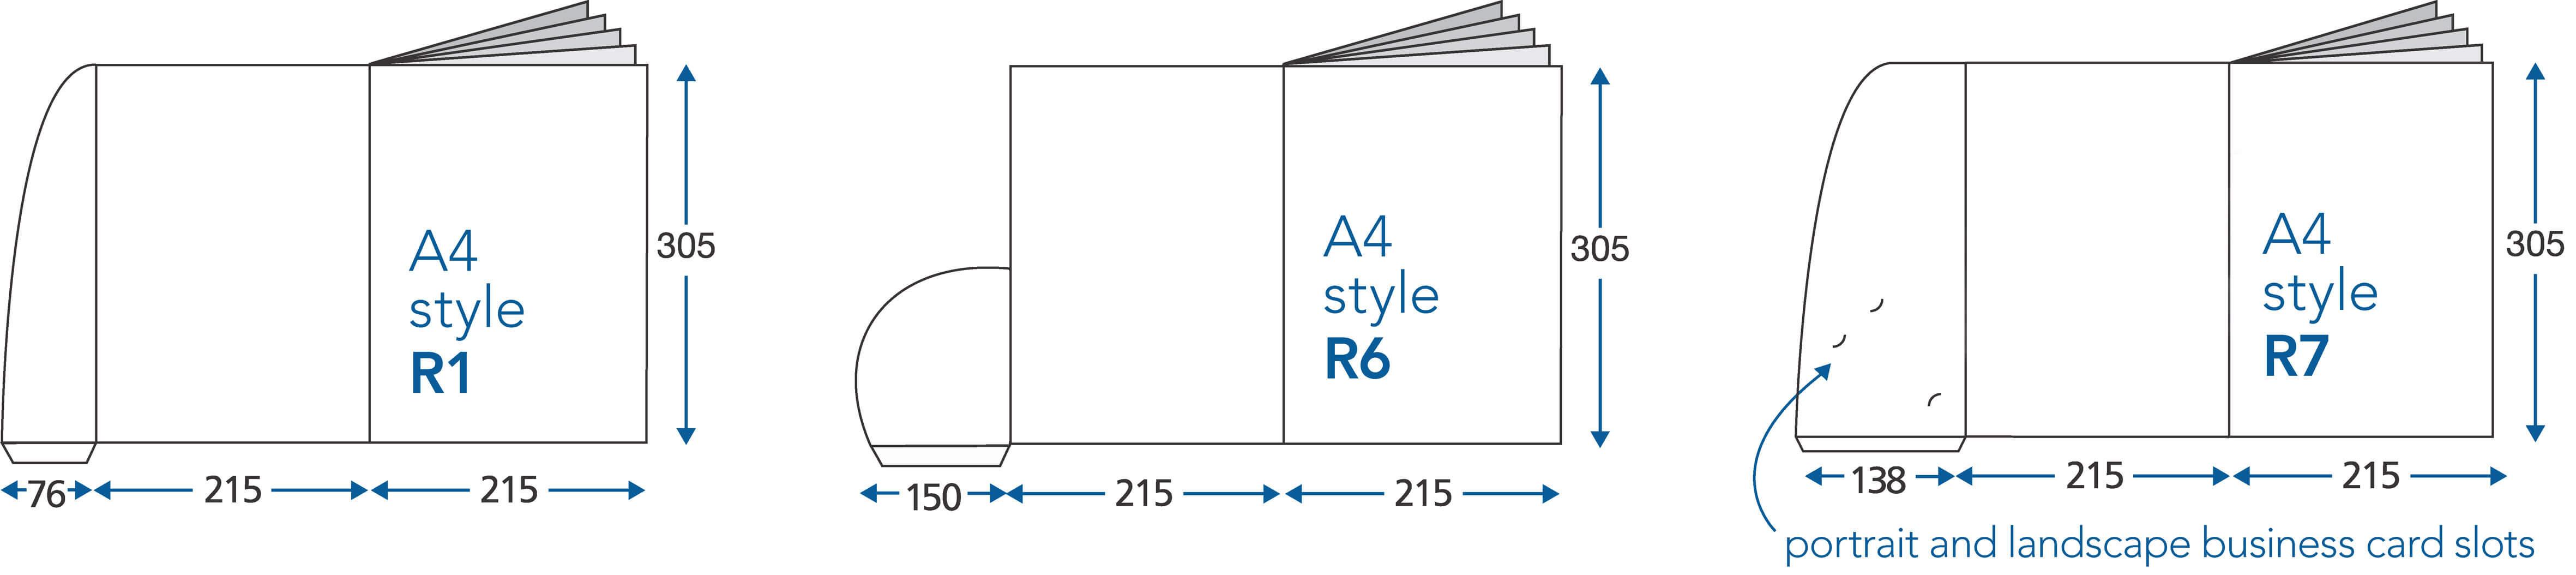 how to supply presentation folder files